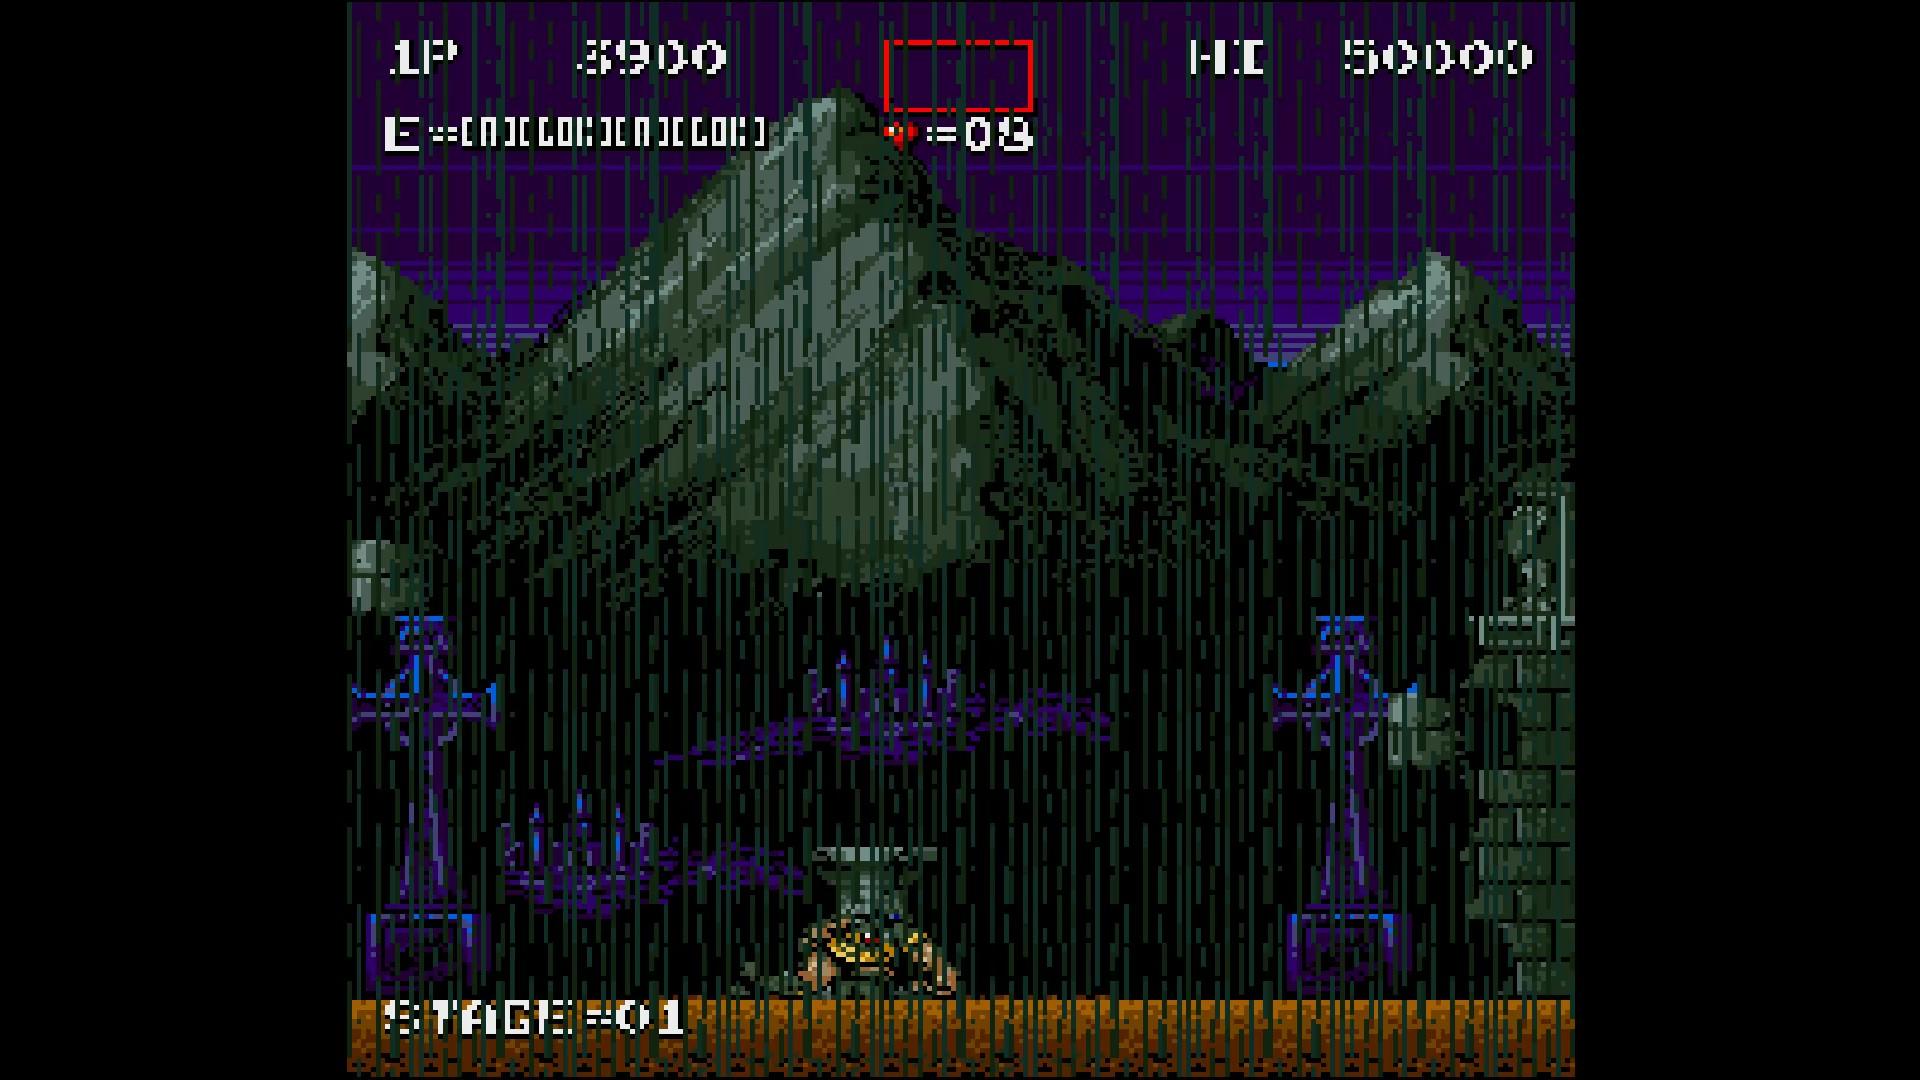 AkinNahtanoj: Haunted Castle [hcastle] (Arcade Emulated / M.A.M.E.) 3,900 points on 2020-08-17 15:47:12